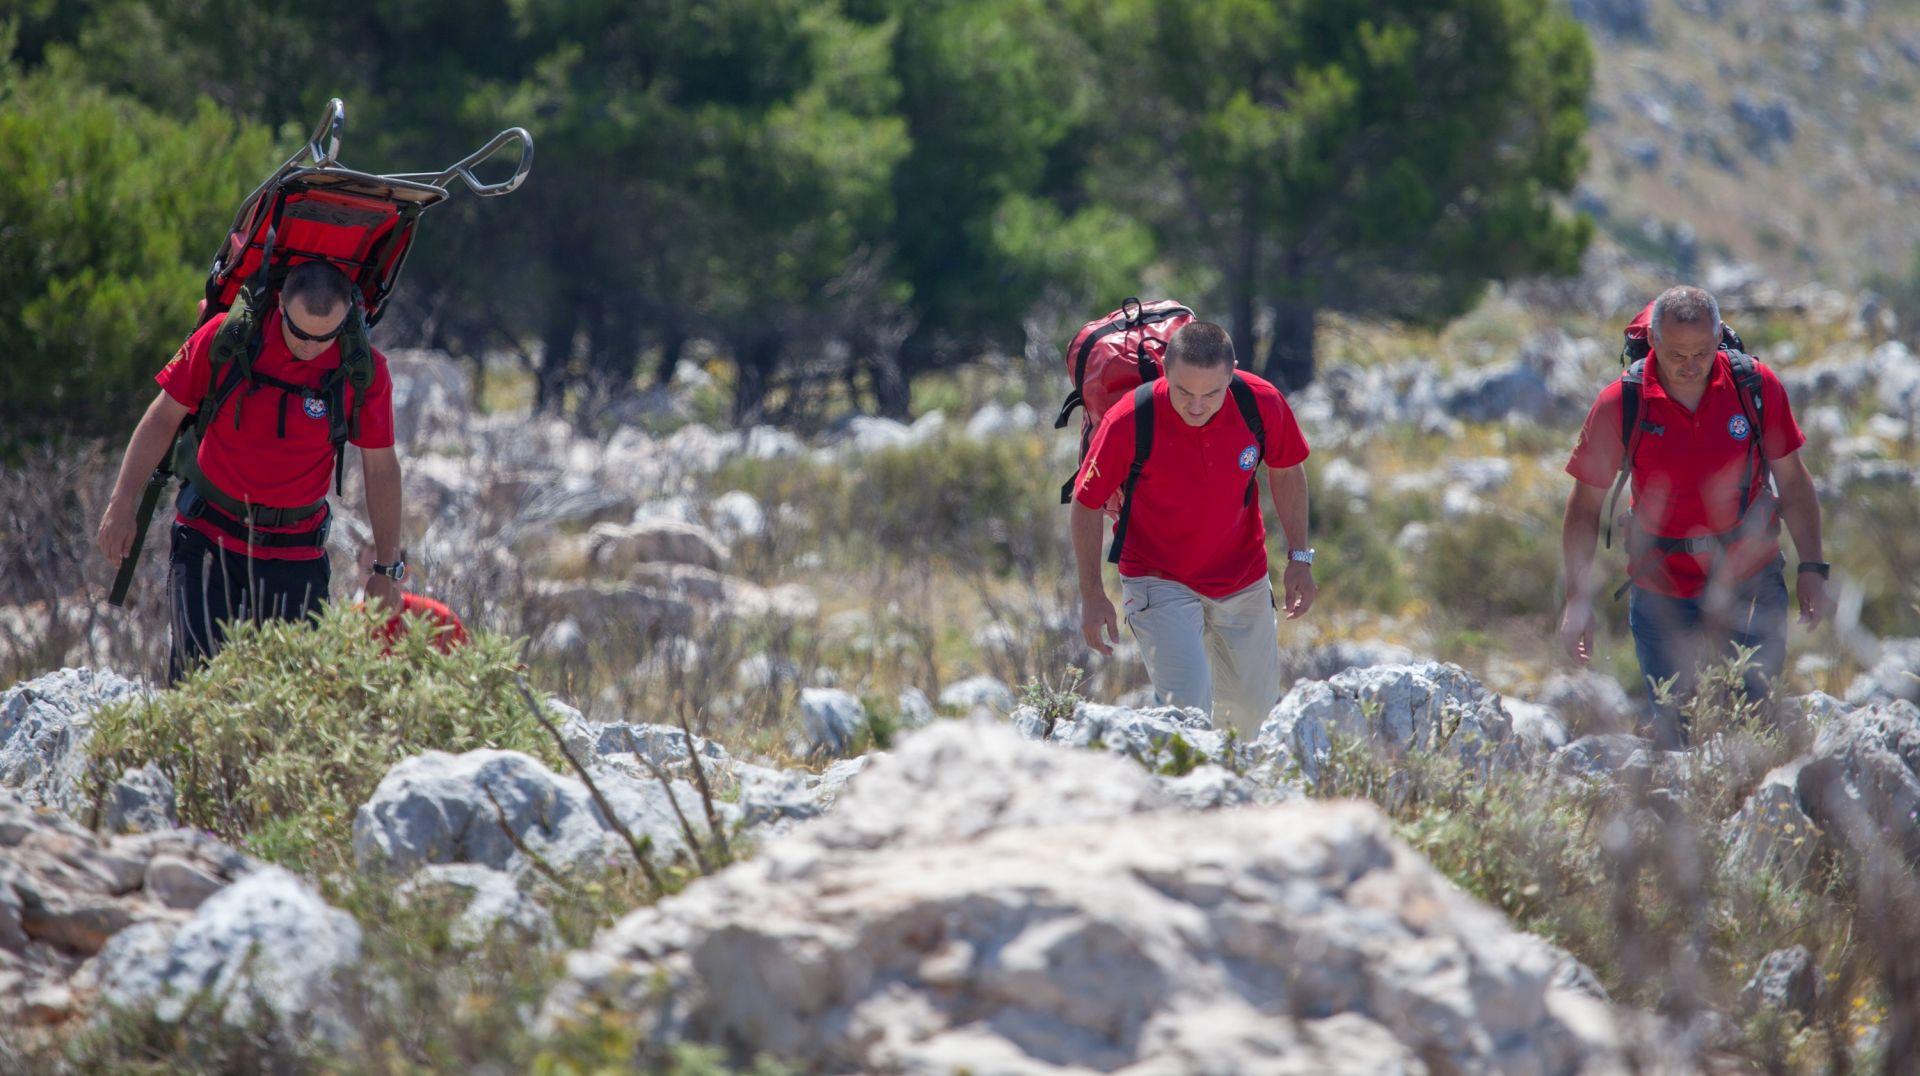 HGSS spasio planinara kojemu je pozlilo dok se kretao Premužićevom stazom